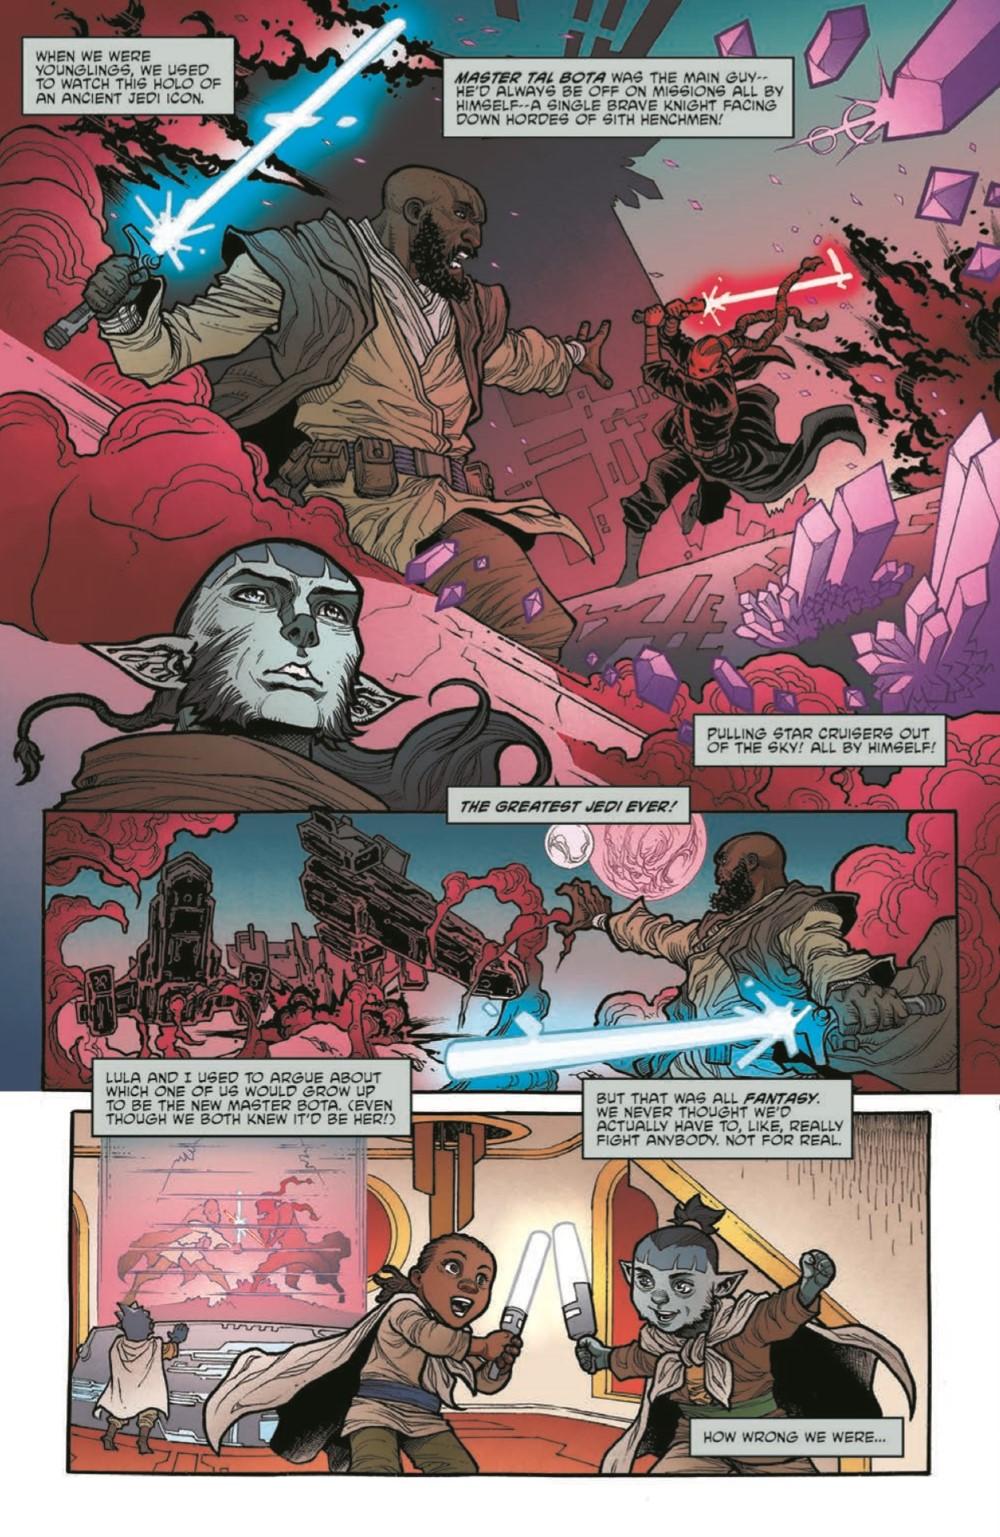 SWAHRA06-pr-3 ComicList Previews: STAR WARS THE HIGH REPUBLIC ADVENTURES #6